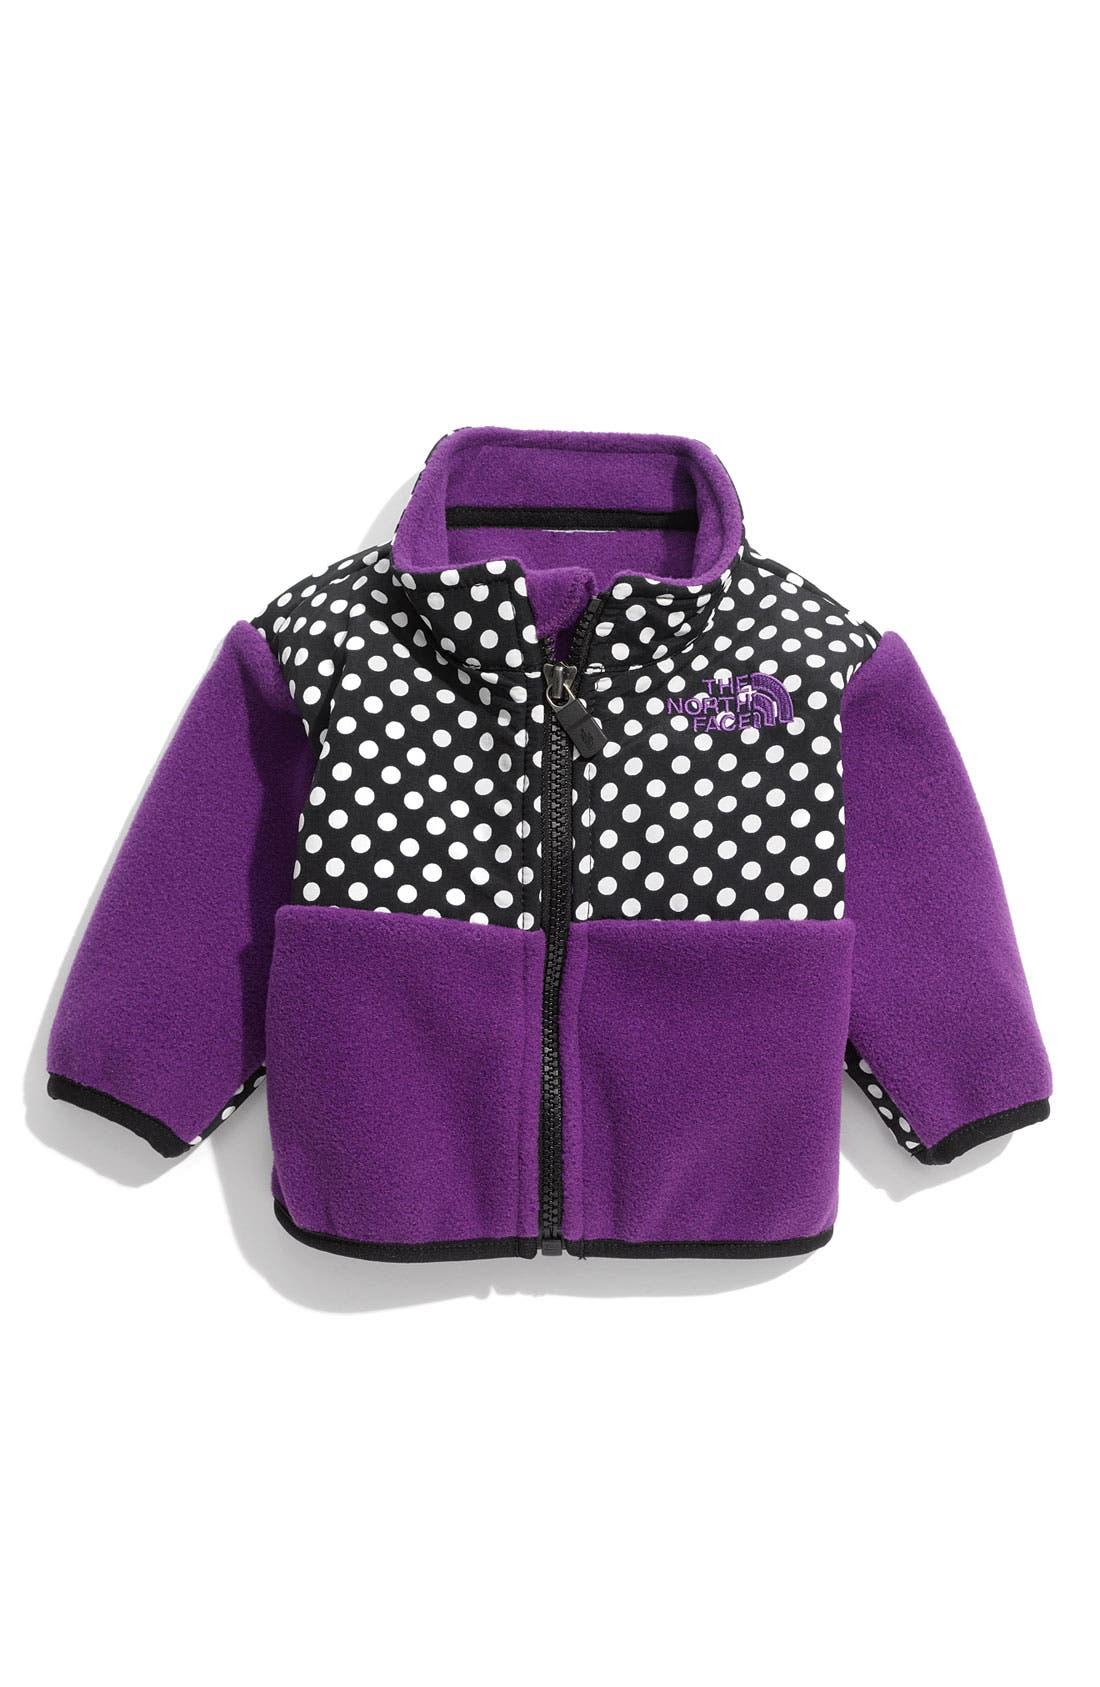 Main Image - The North Face 'Denali' Fleece Jacket (Infant)